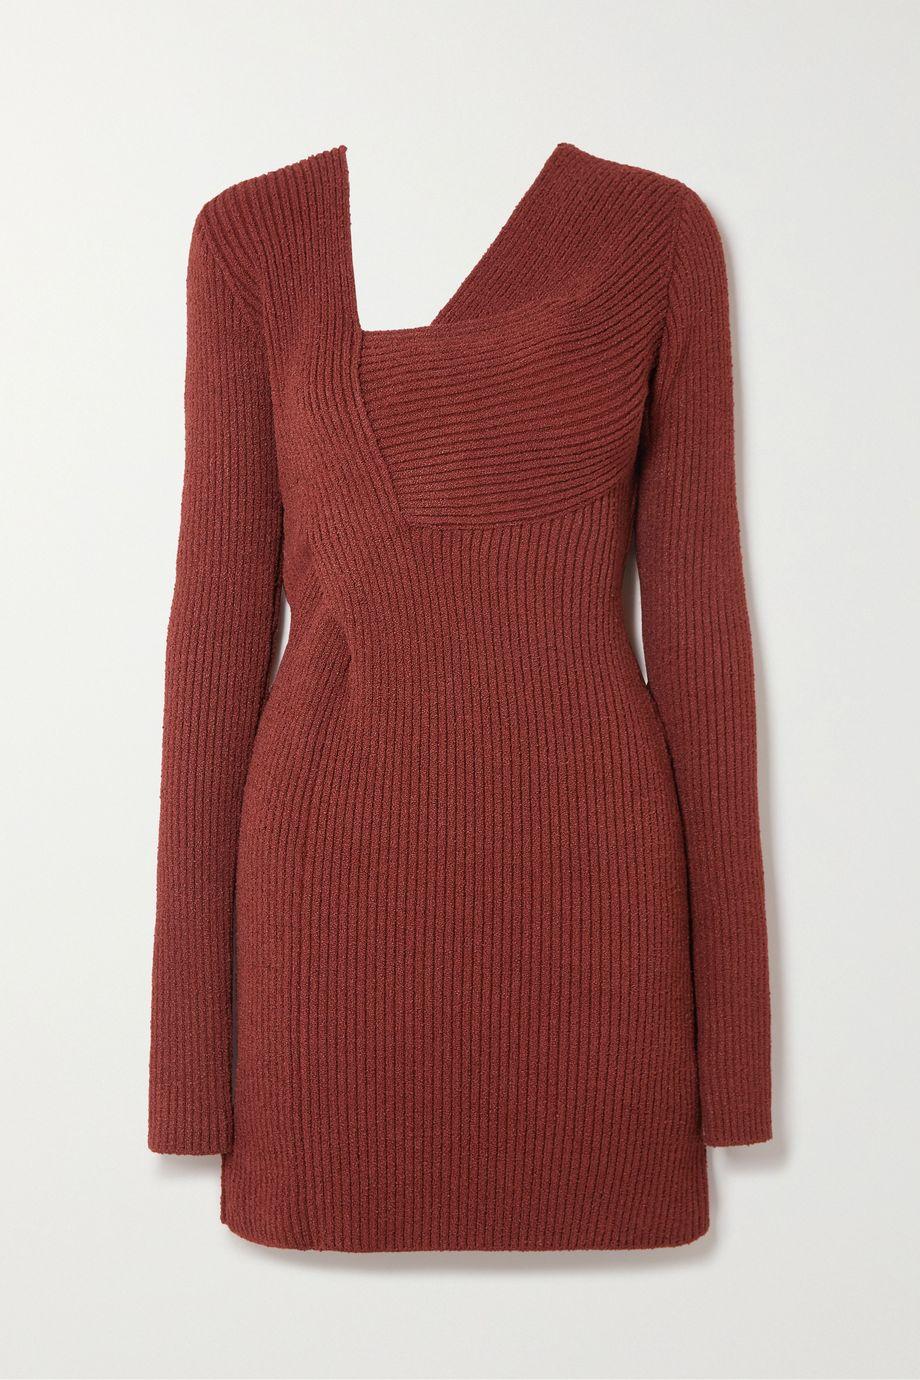 Bottega Veneta Cutout ribbed silk-blend chenille mini dress